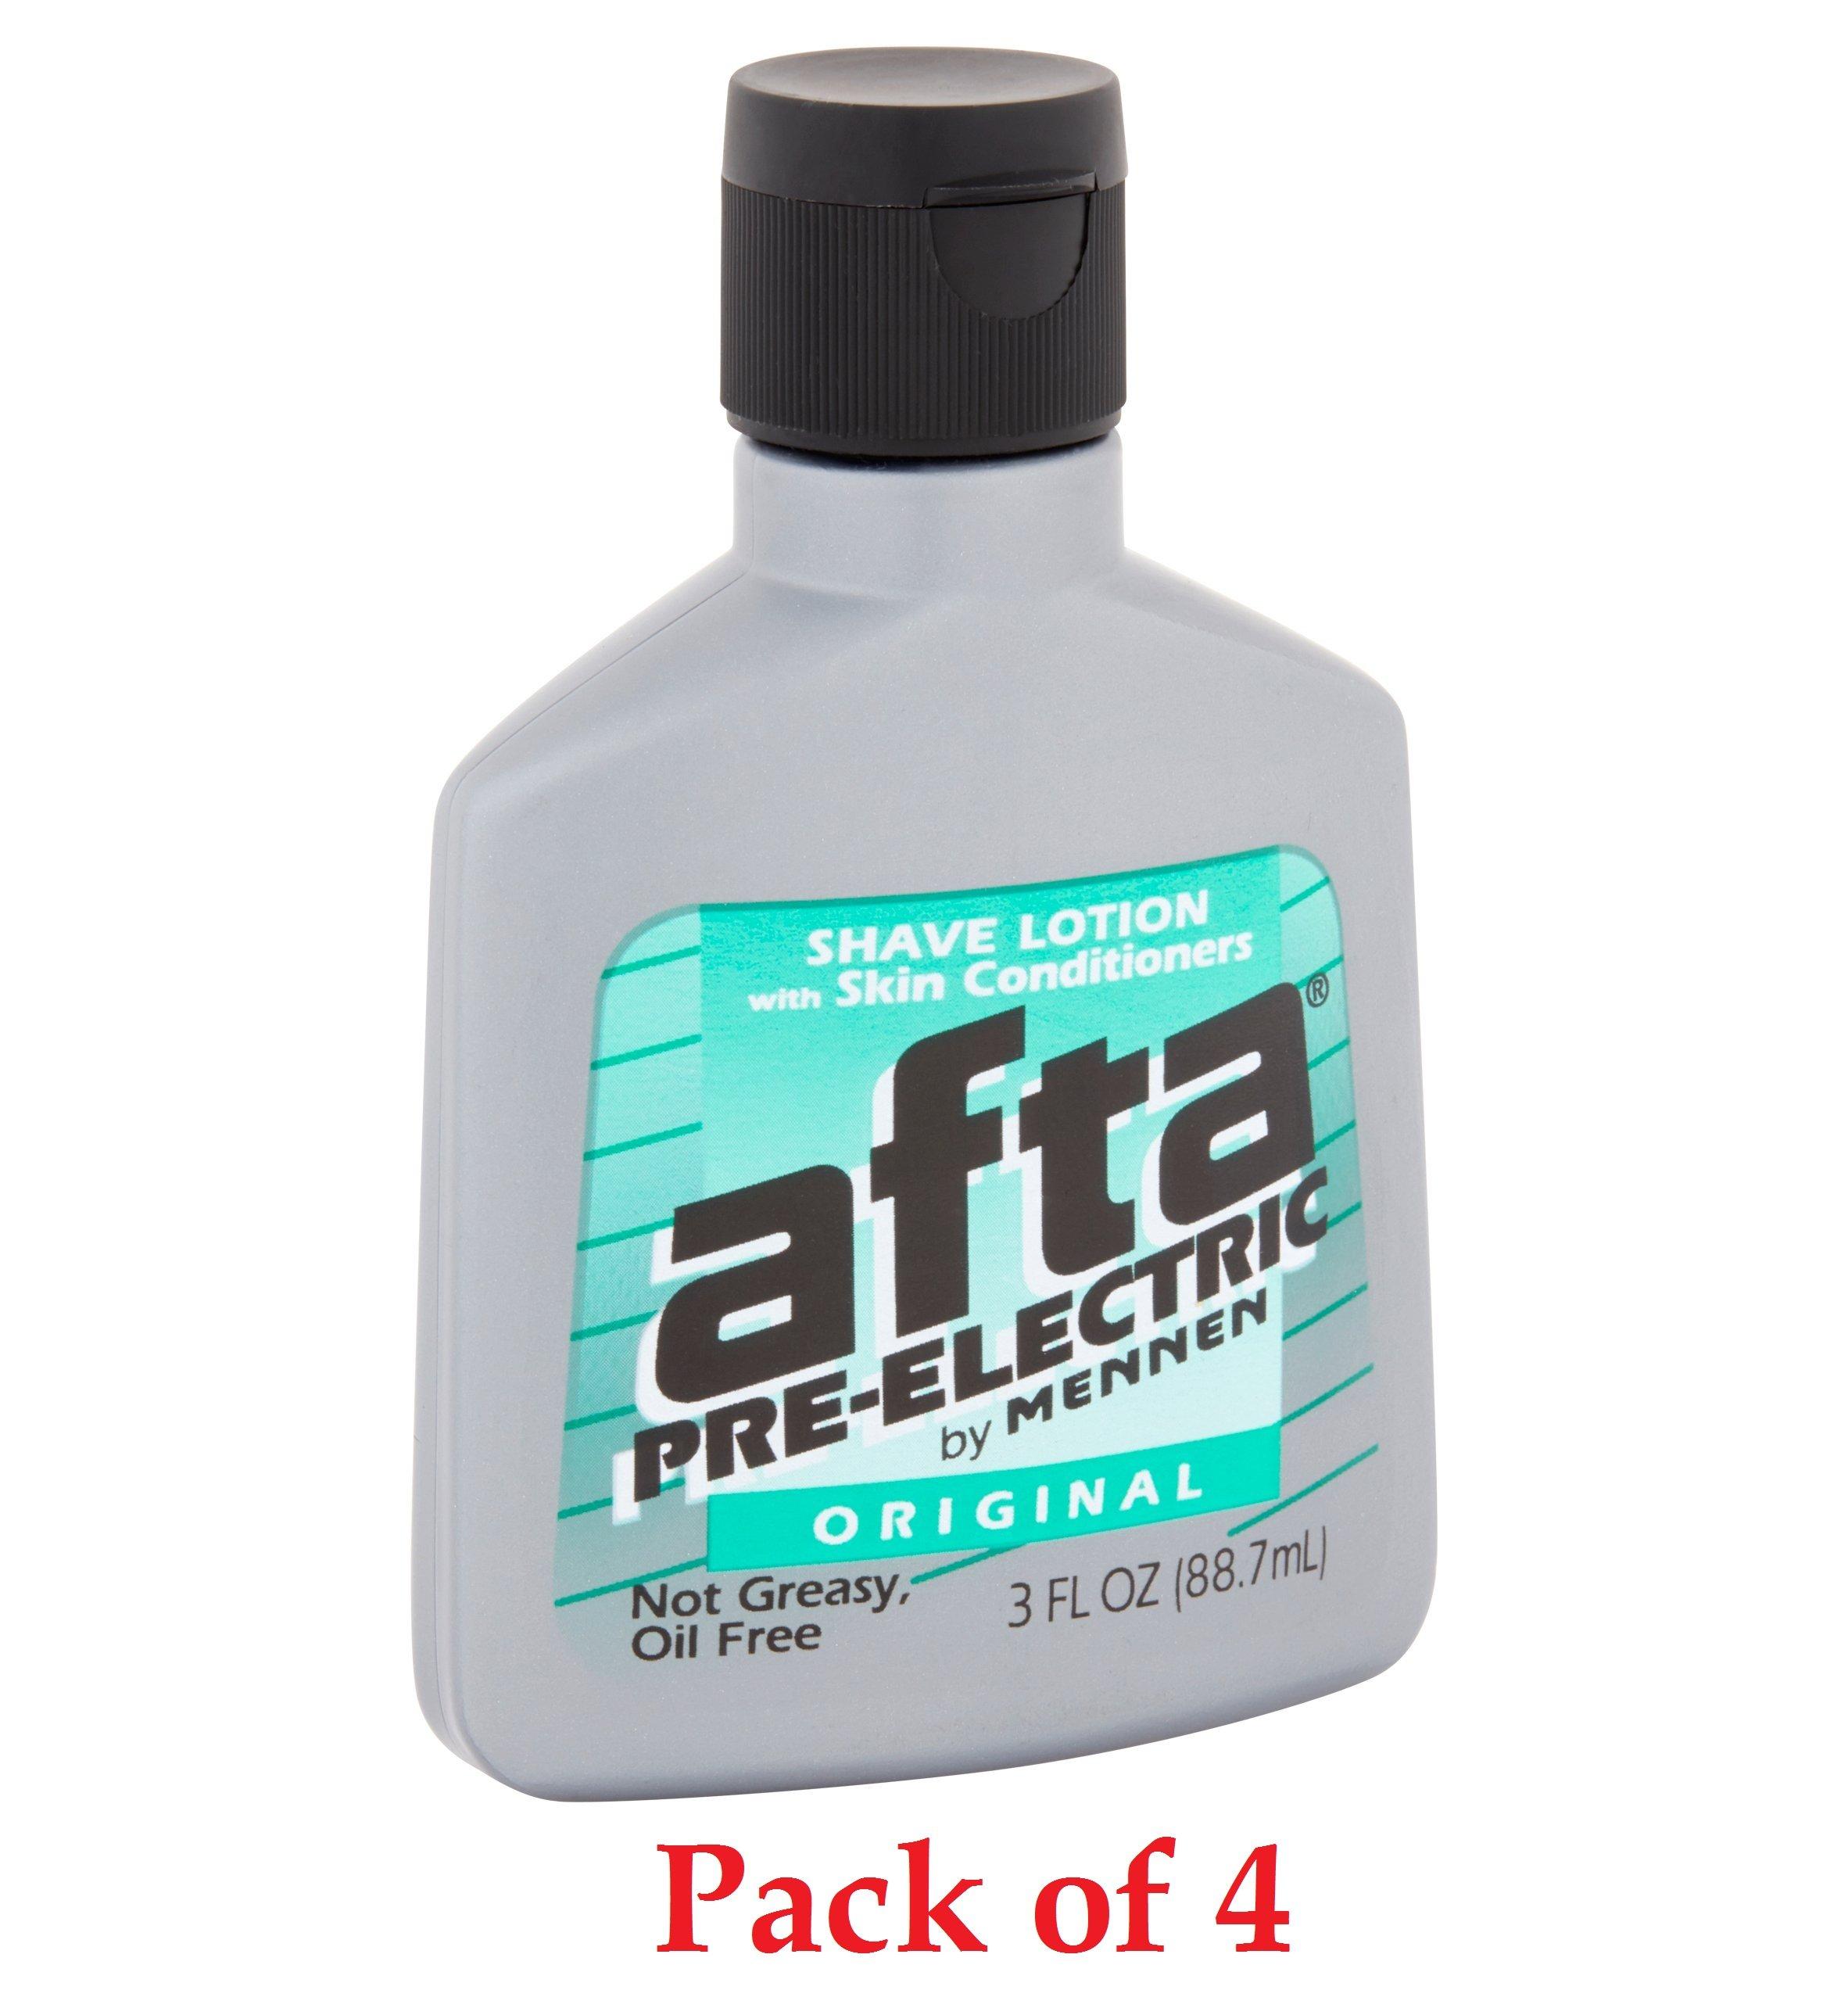 Mennen Afta Pre Electric Shave Lotion Skin Conditioners Original 3oz